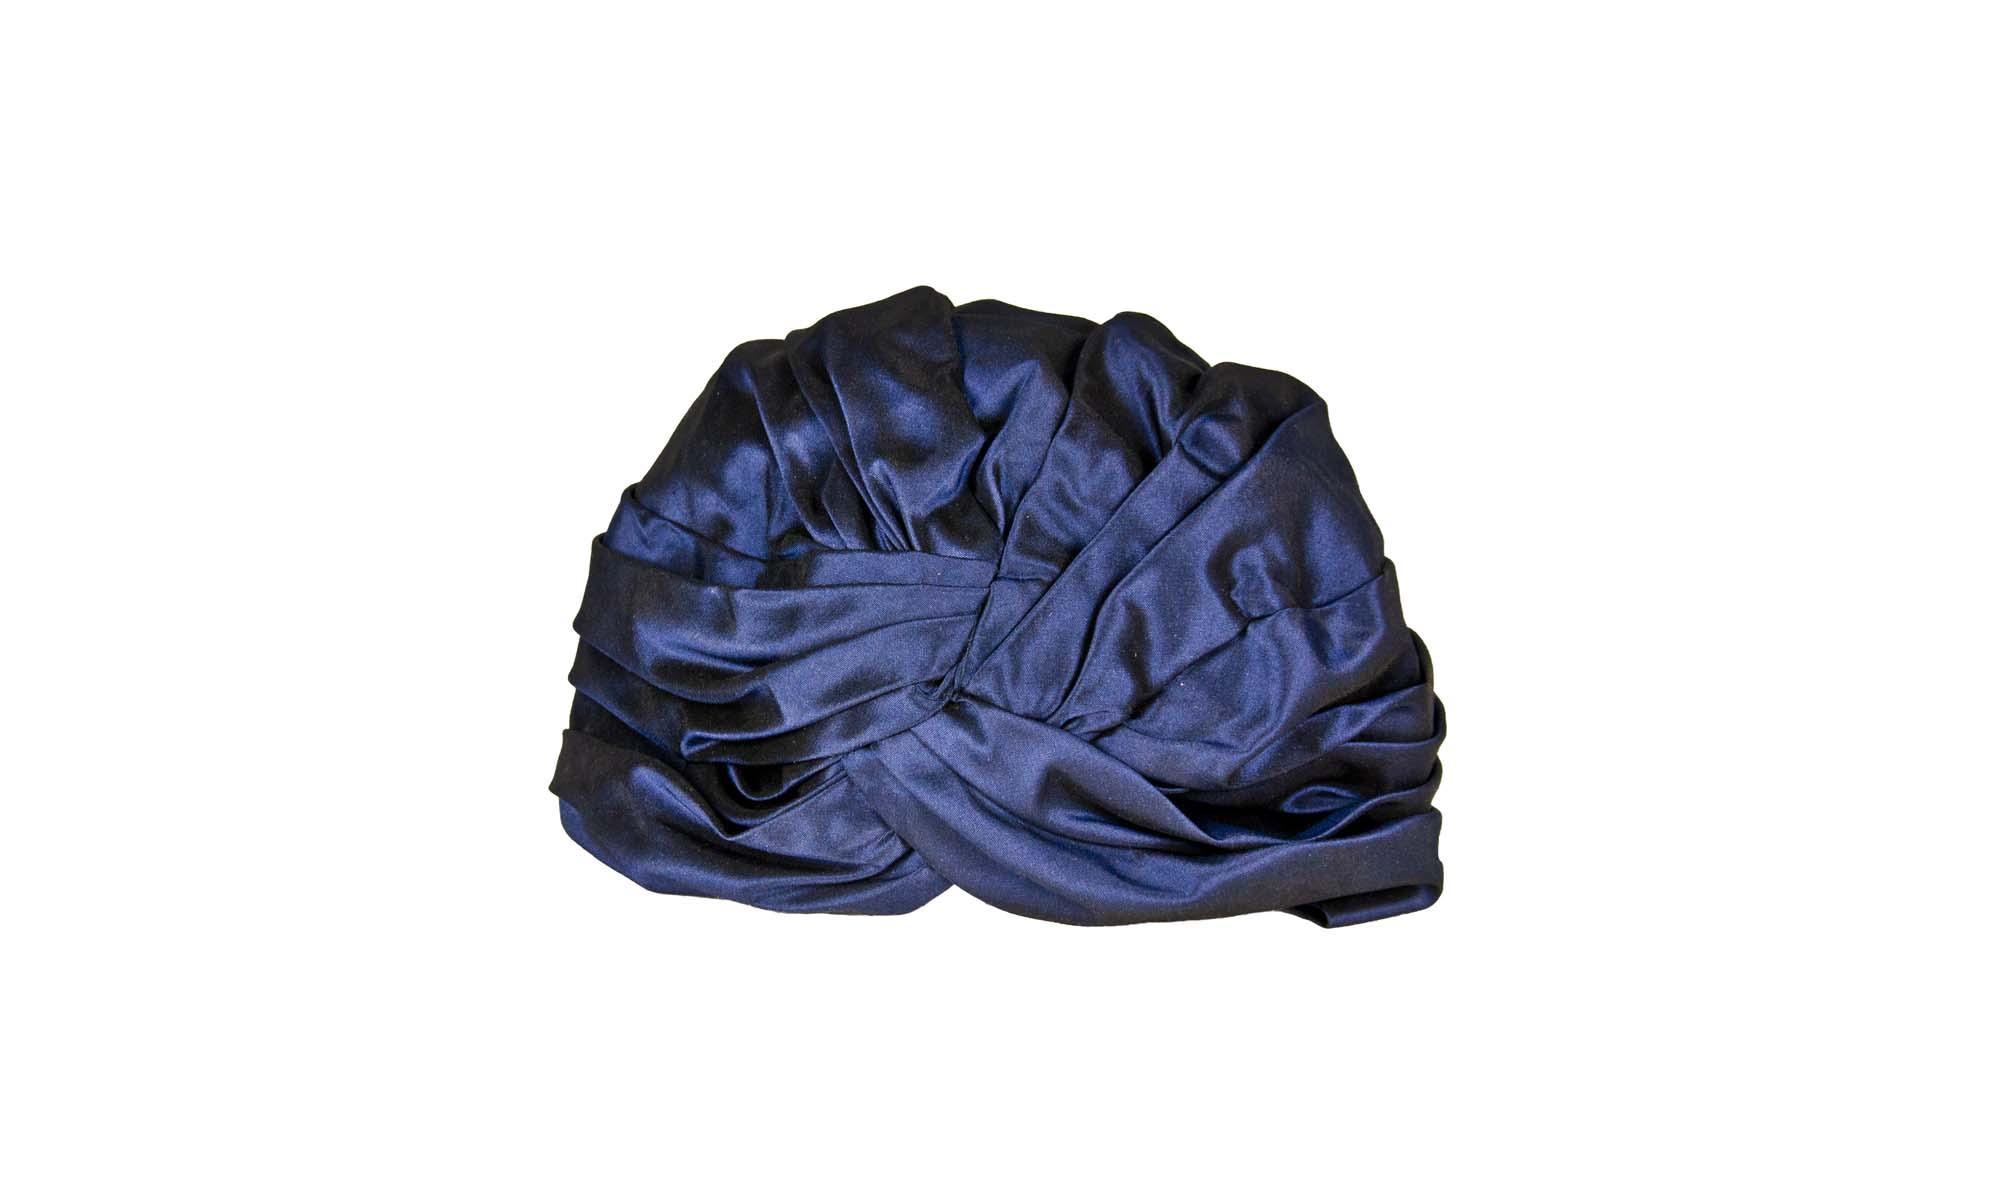 TRECCIA SS16 Taffettas Blue